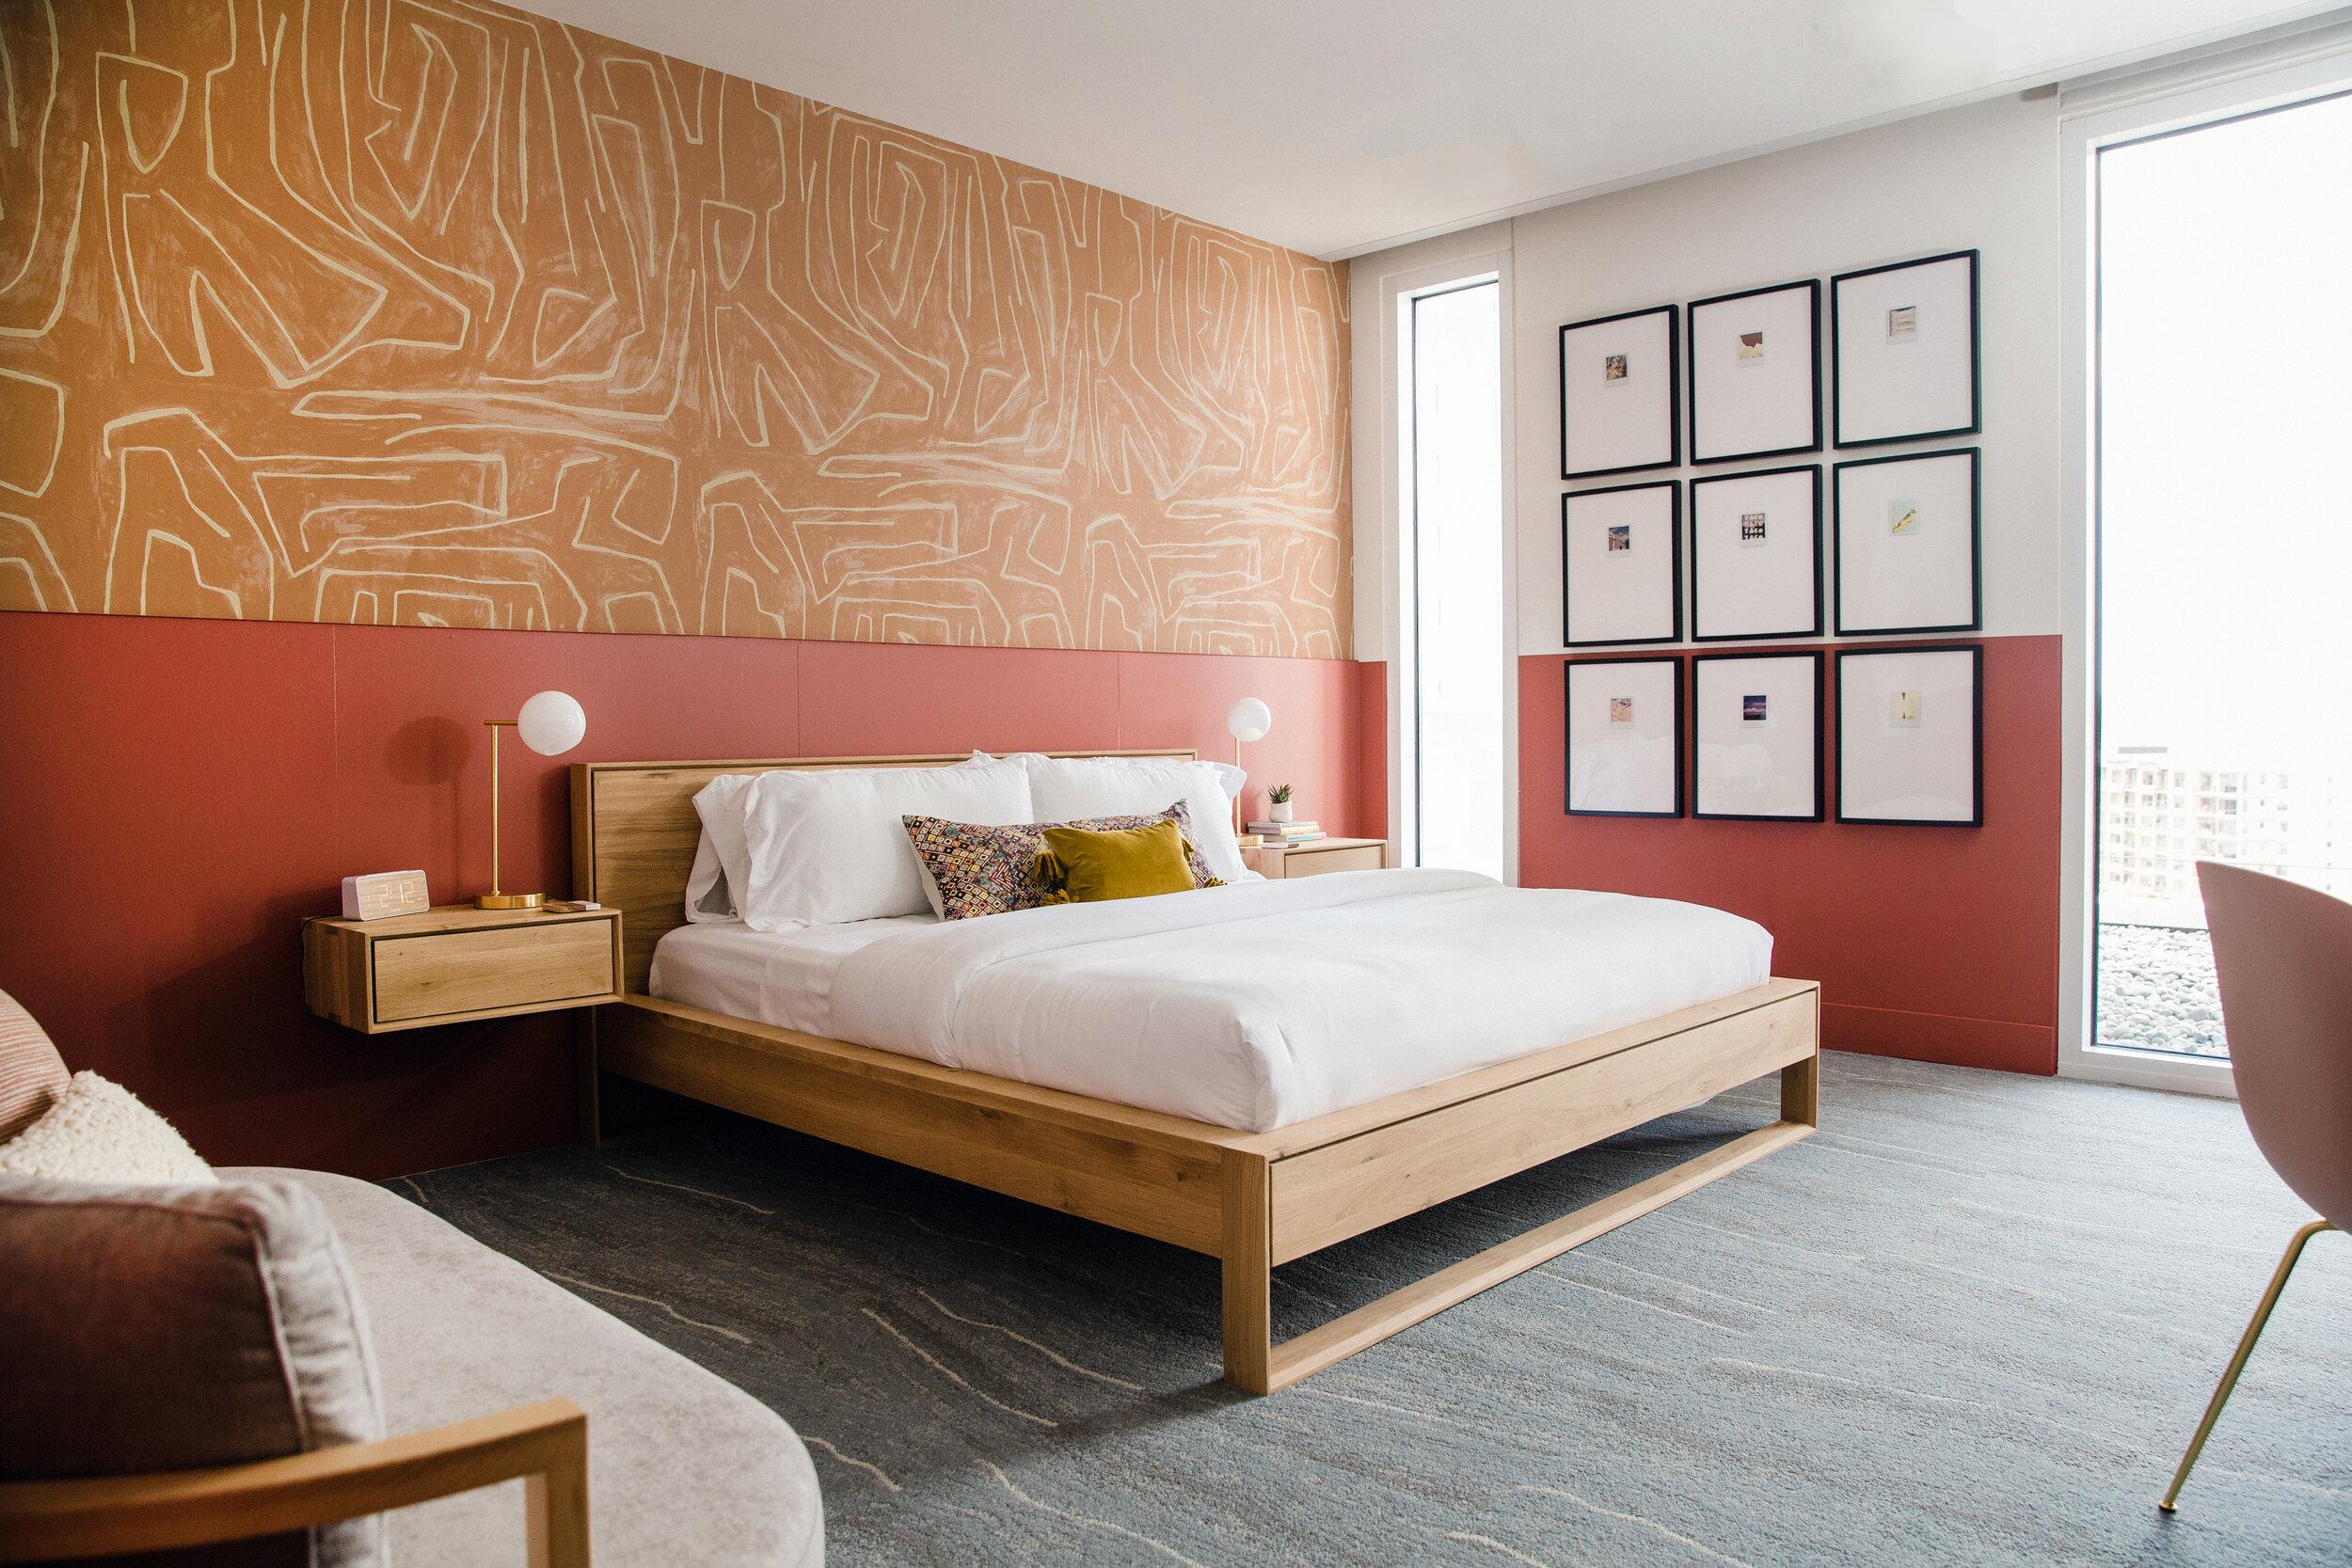 independent condo guest suites